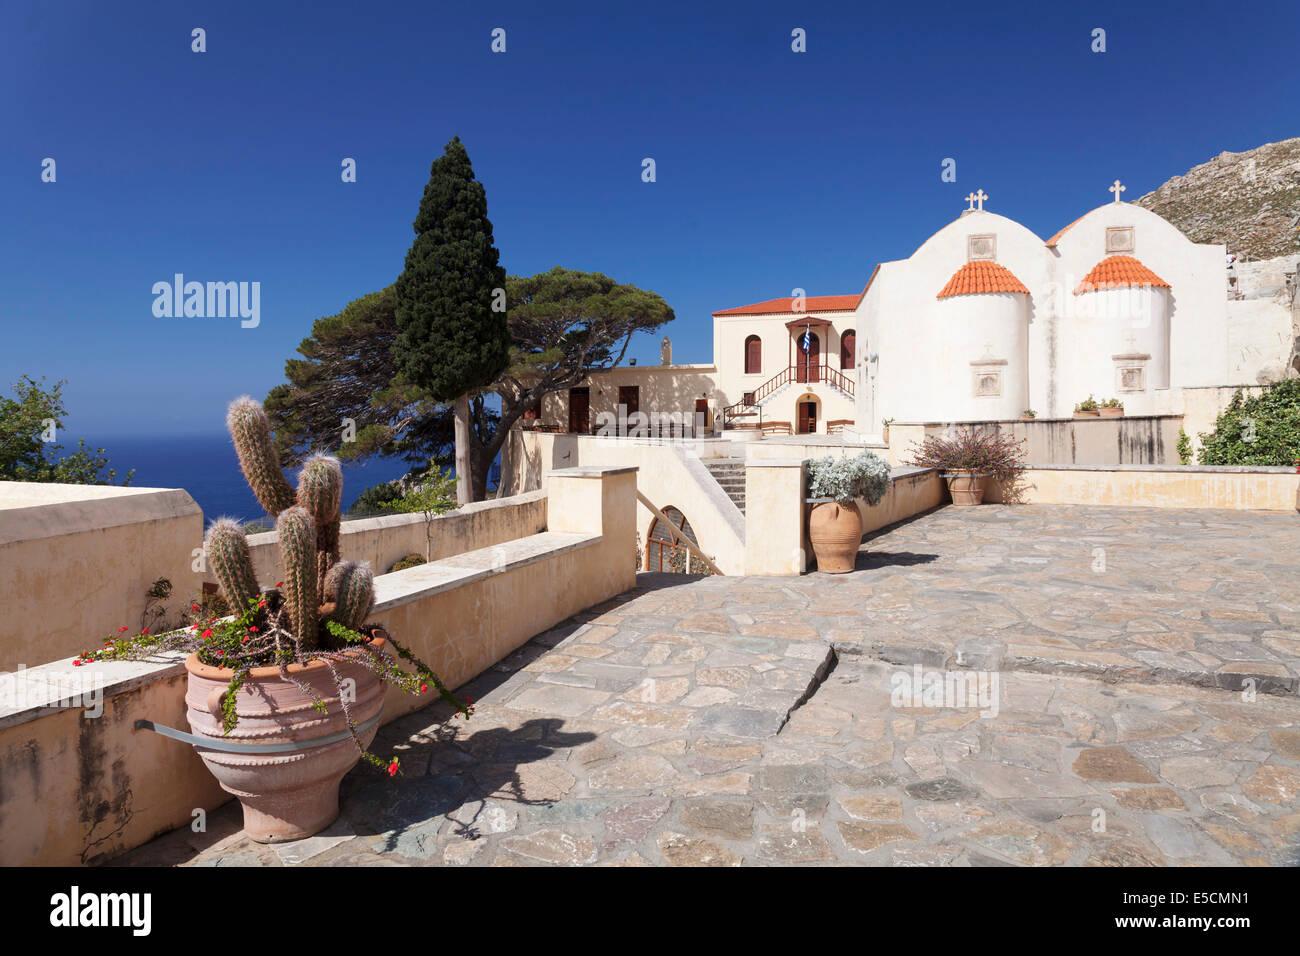 Kloster Preveli, Rethymno, Kreta, Griechenland Stockbild